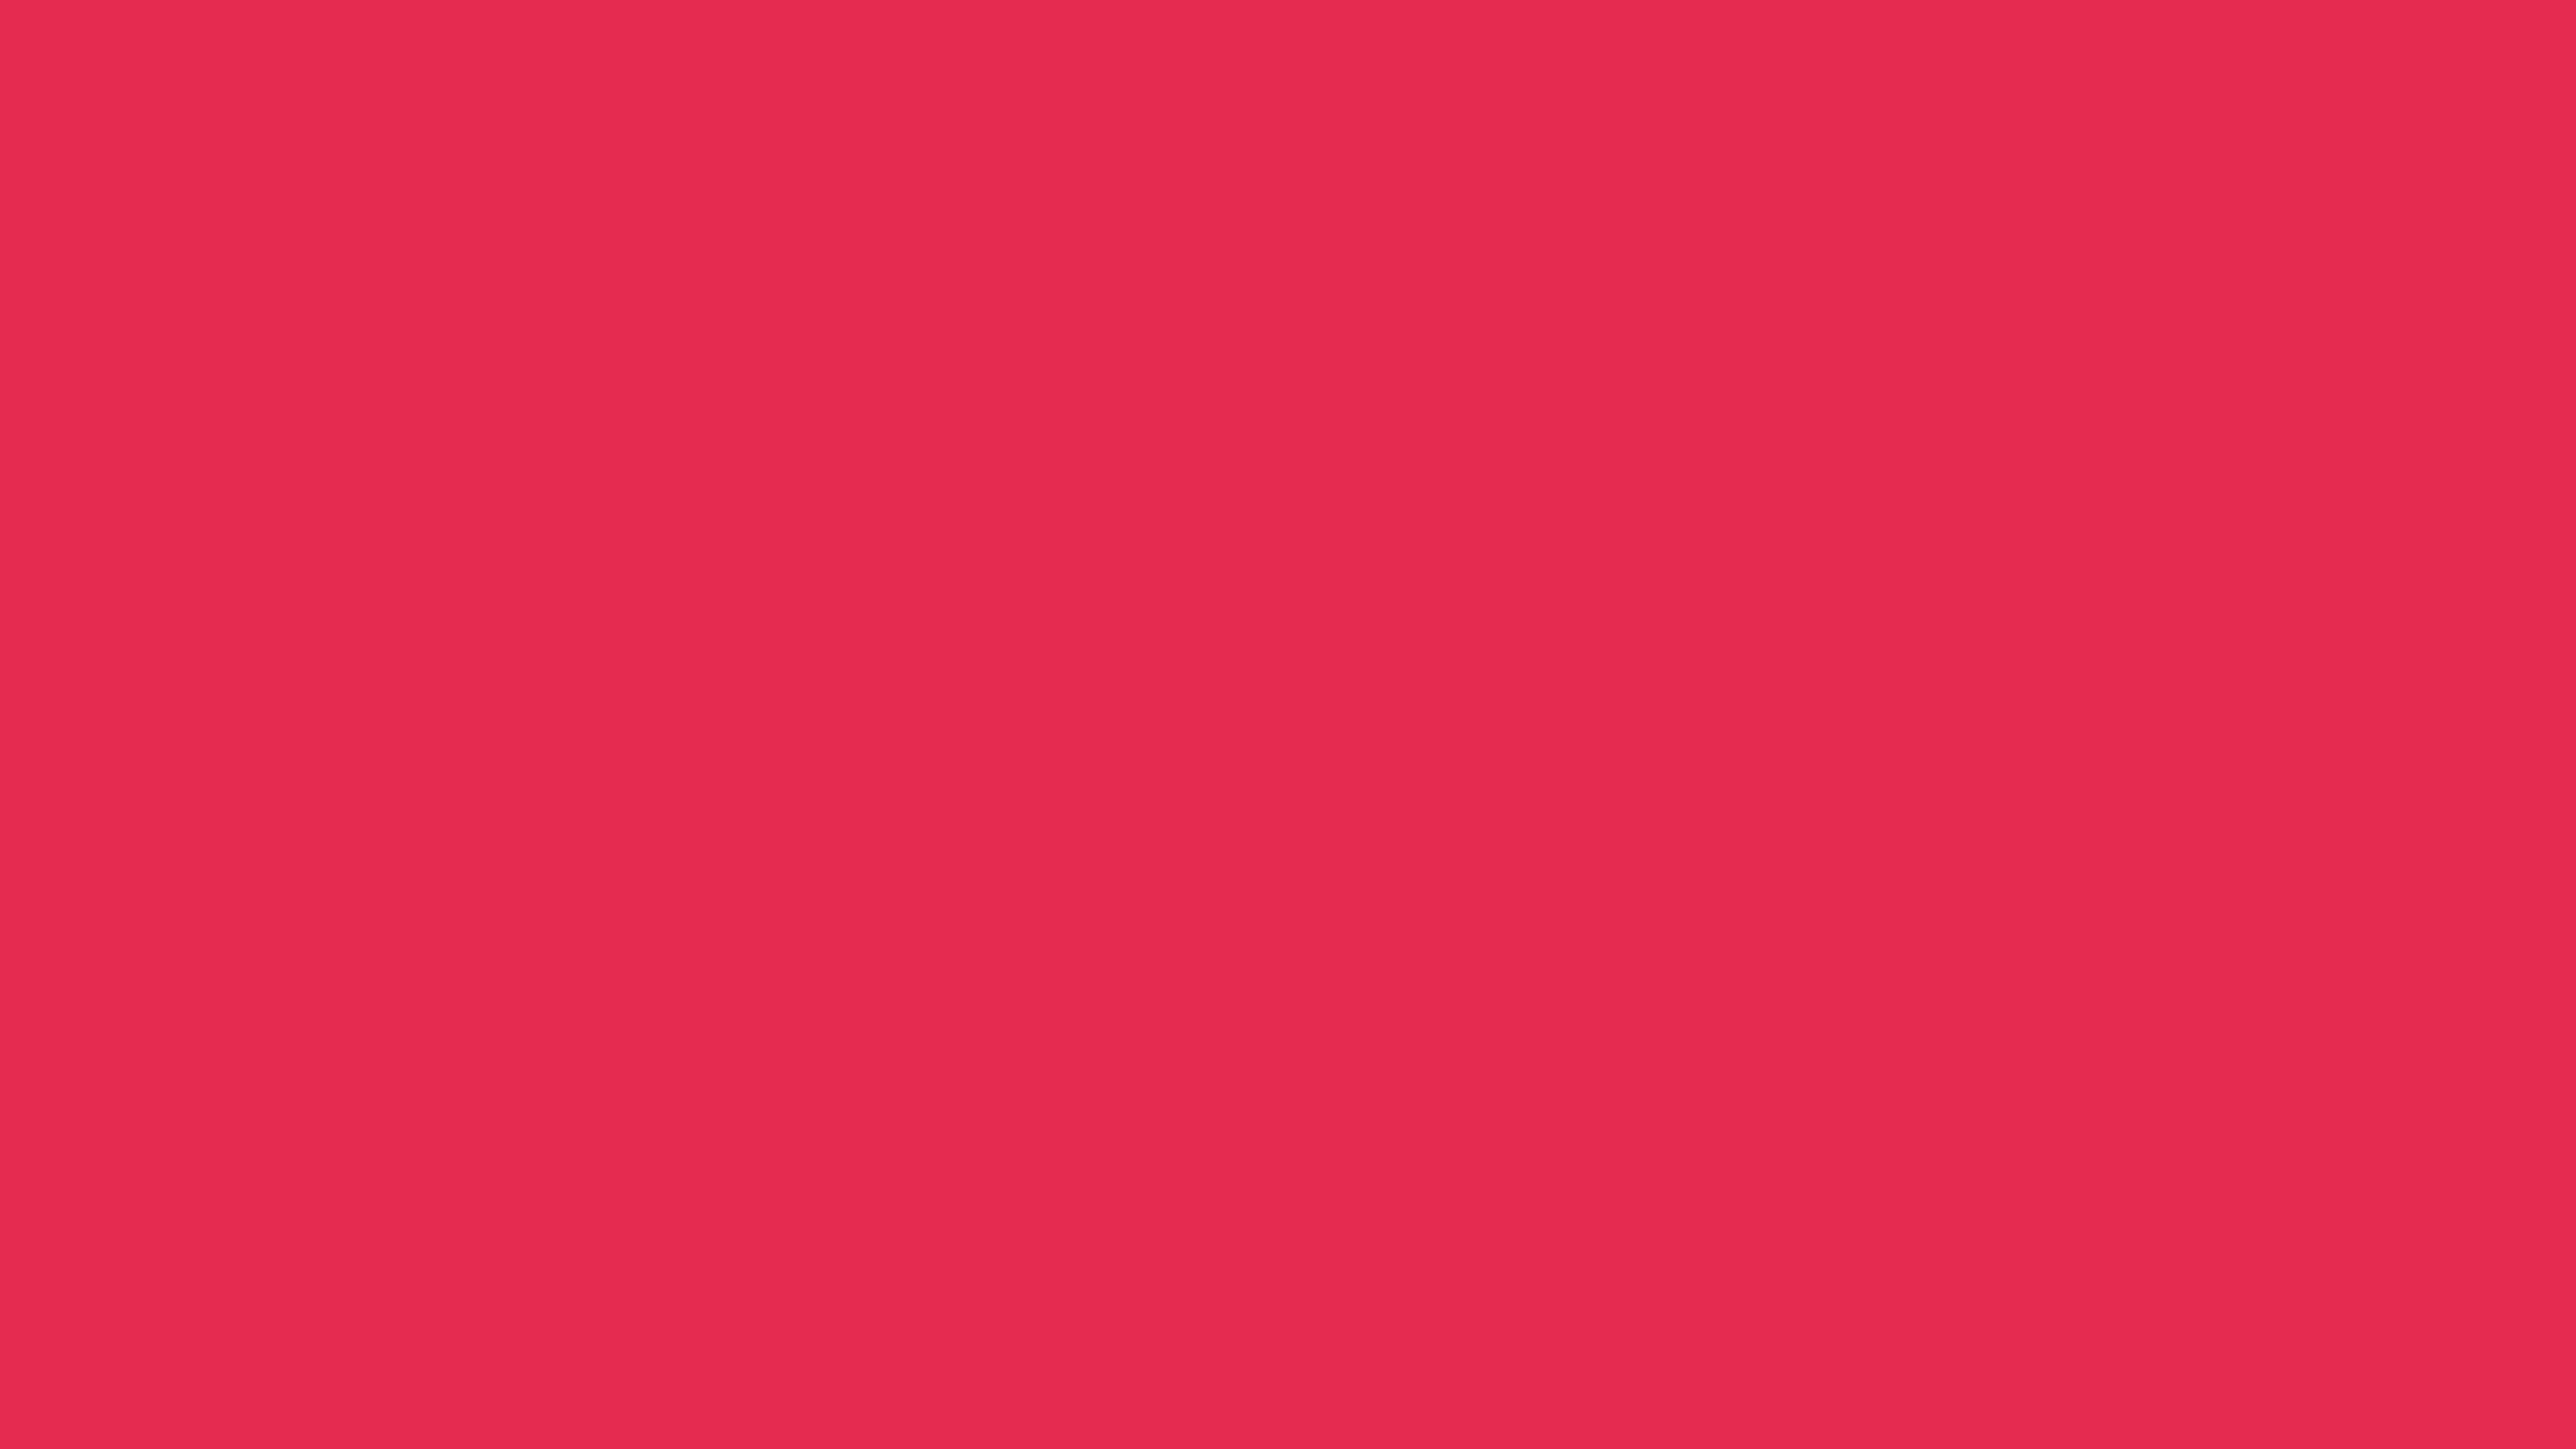 5120x2880 Amaranth Solid Color Background